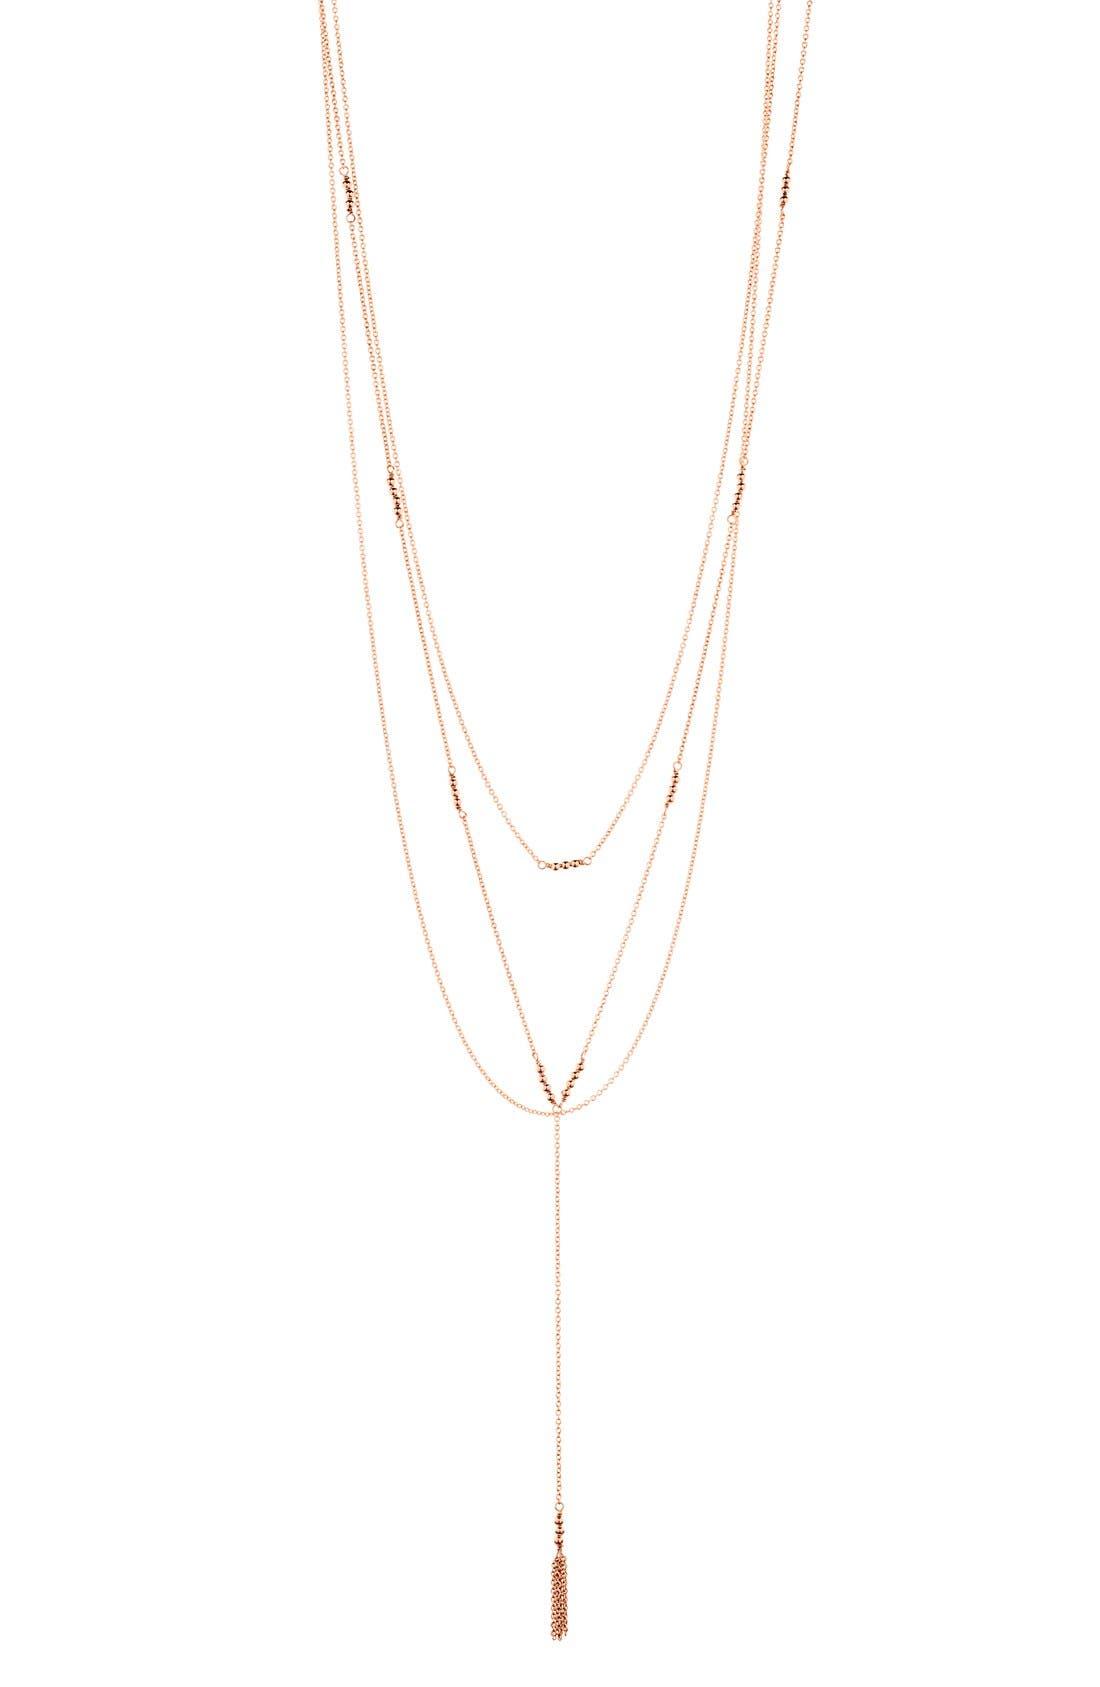 Main Image - gorjana Joplin Multistrand Lariat Necklace